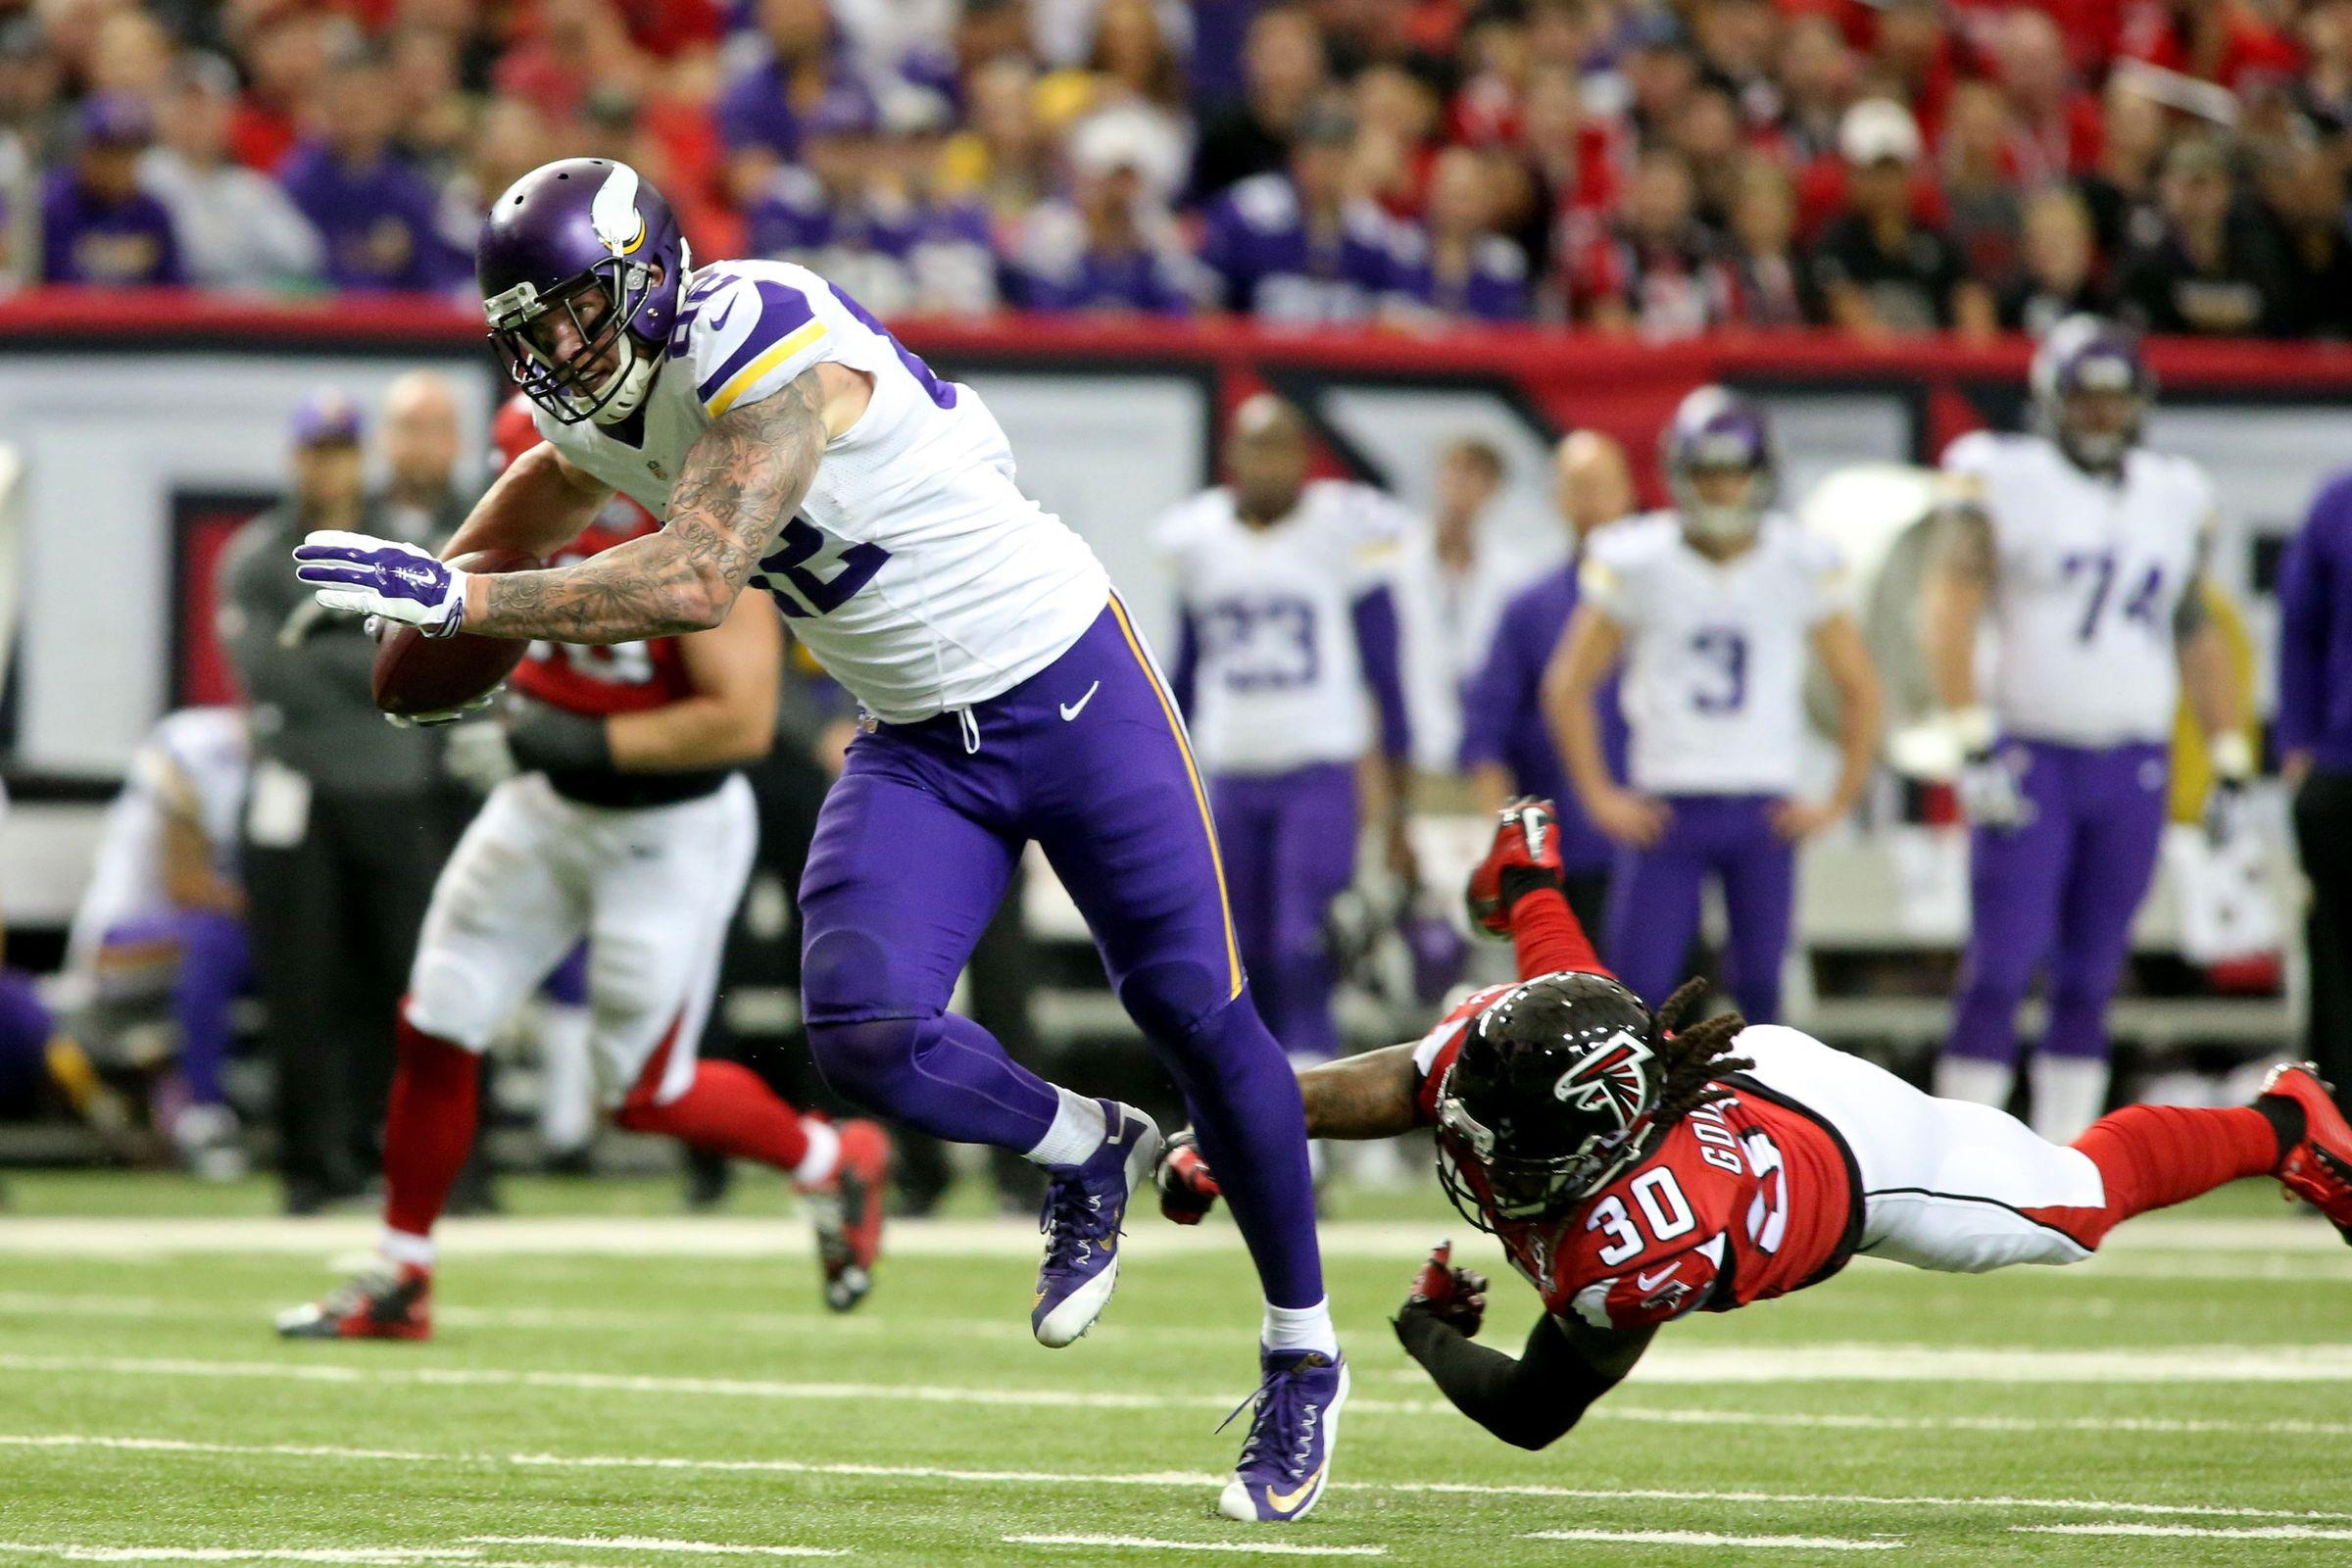 [NFL] Week 12: Peterson mette in ginocchio Atlanta (Minnesota Vikings vs Atlanta Falcons 20-10)